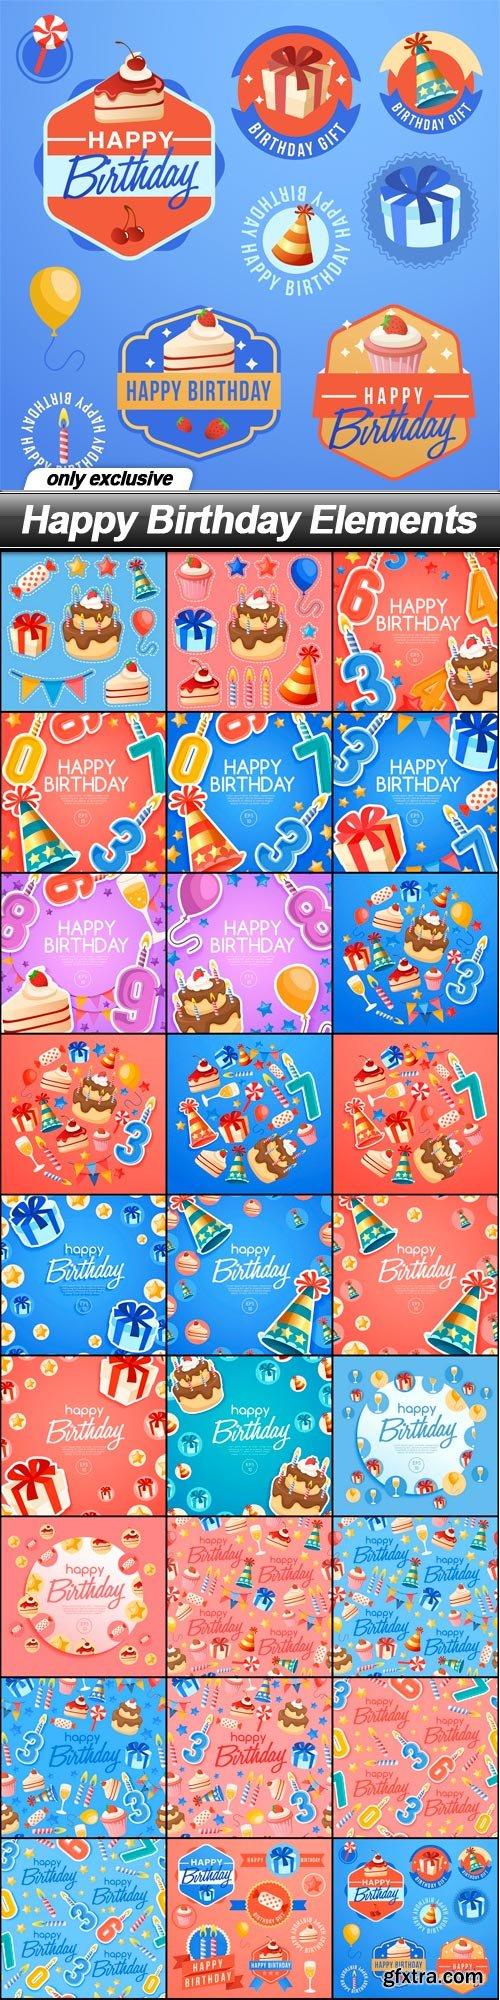 Happy Birthday Elements - 27 EPS